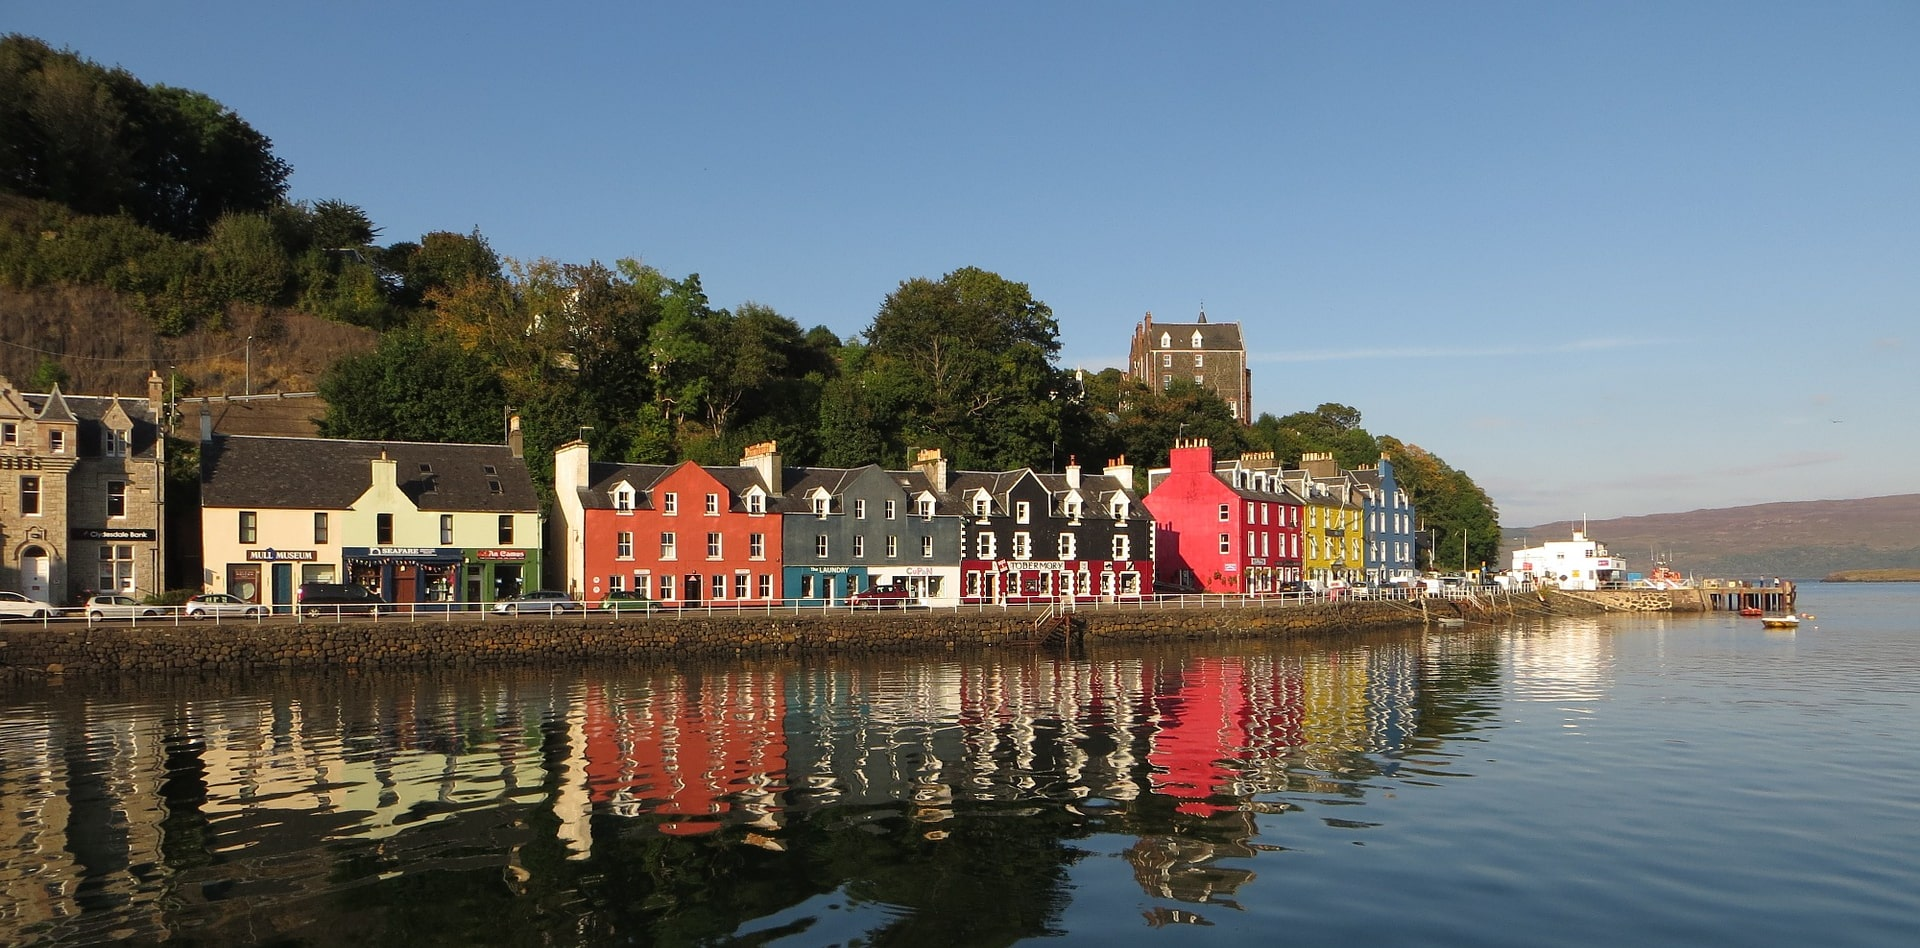 Private tour to Edinburgh, Brodick, Tobermory, Fort William, Glasgow in Scotland